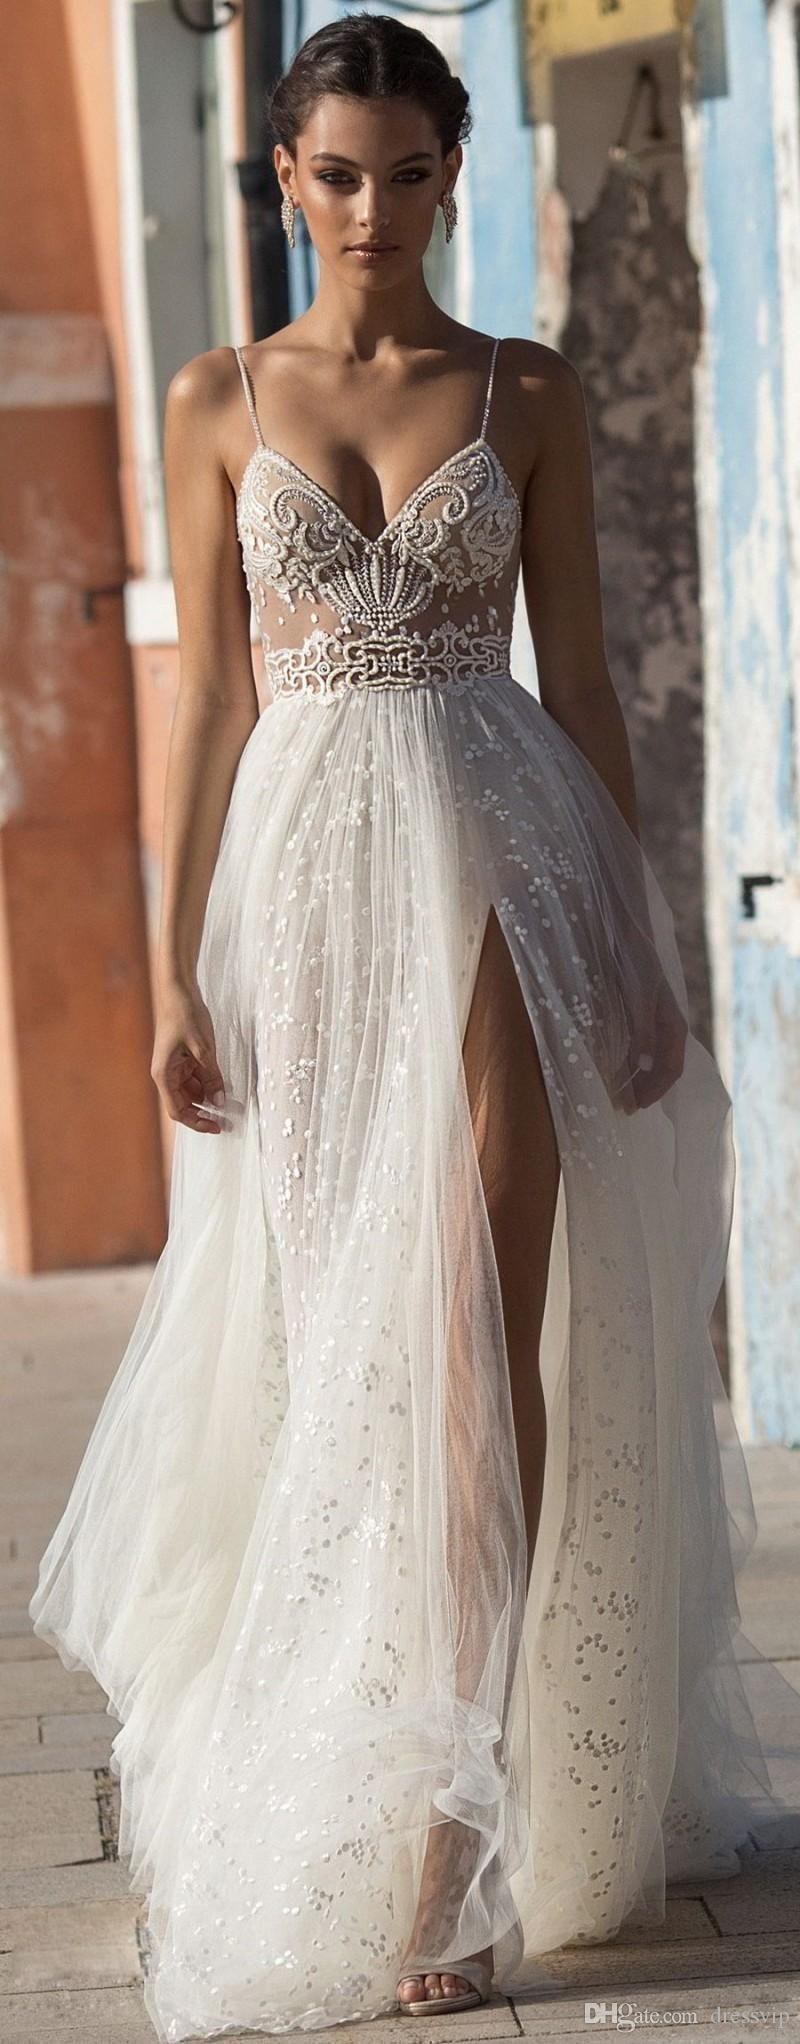 Stunning Full Tulle Skirt Wedding Dresses 2019 Romantic Lantern Sleeve Fairytale Countryside Bridal Gowns Wedding Vestidos